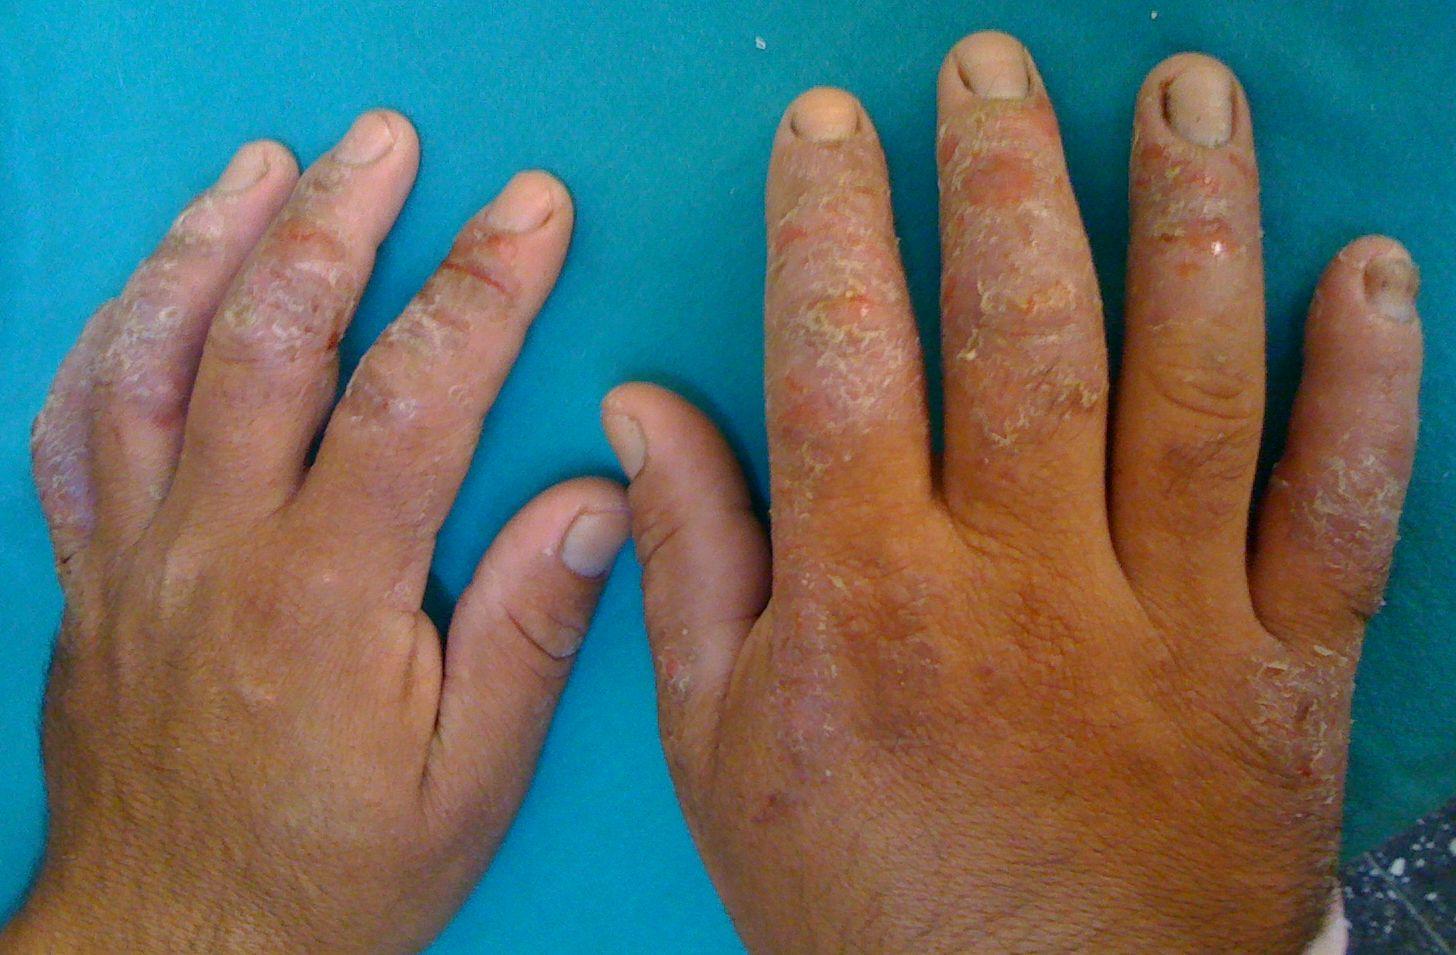 Latex allergy